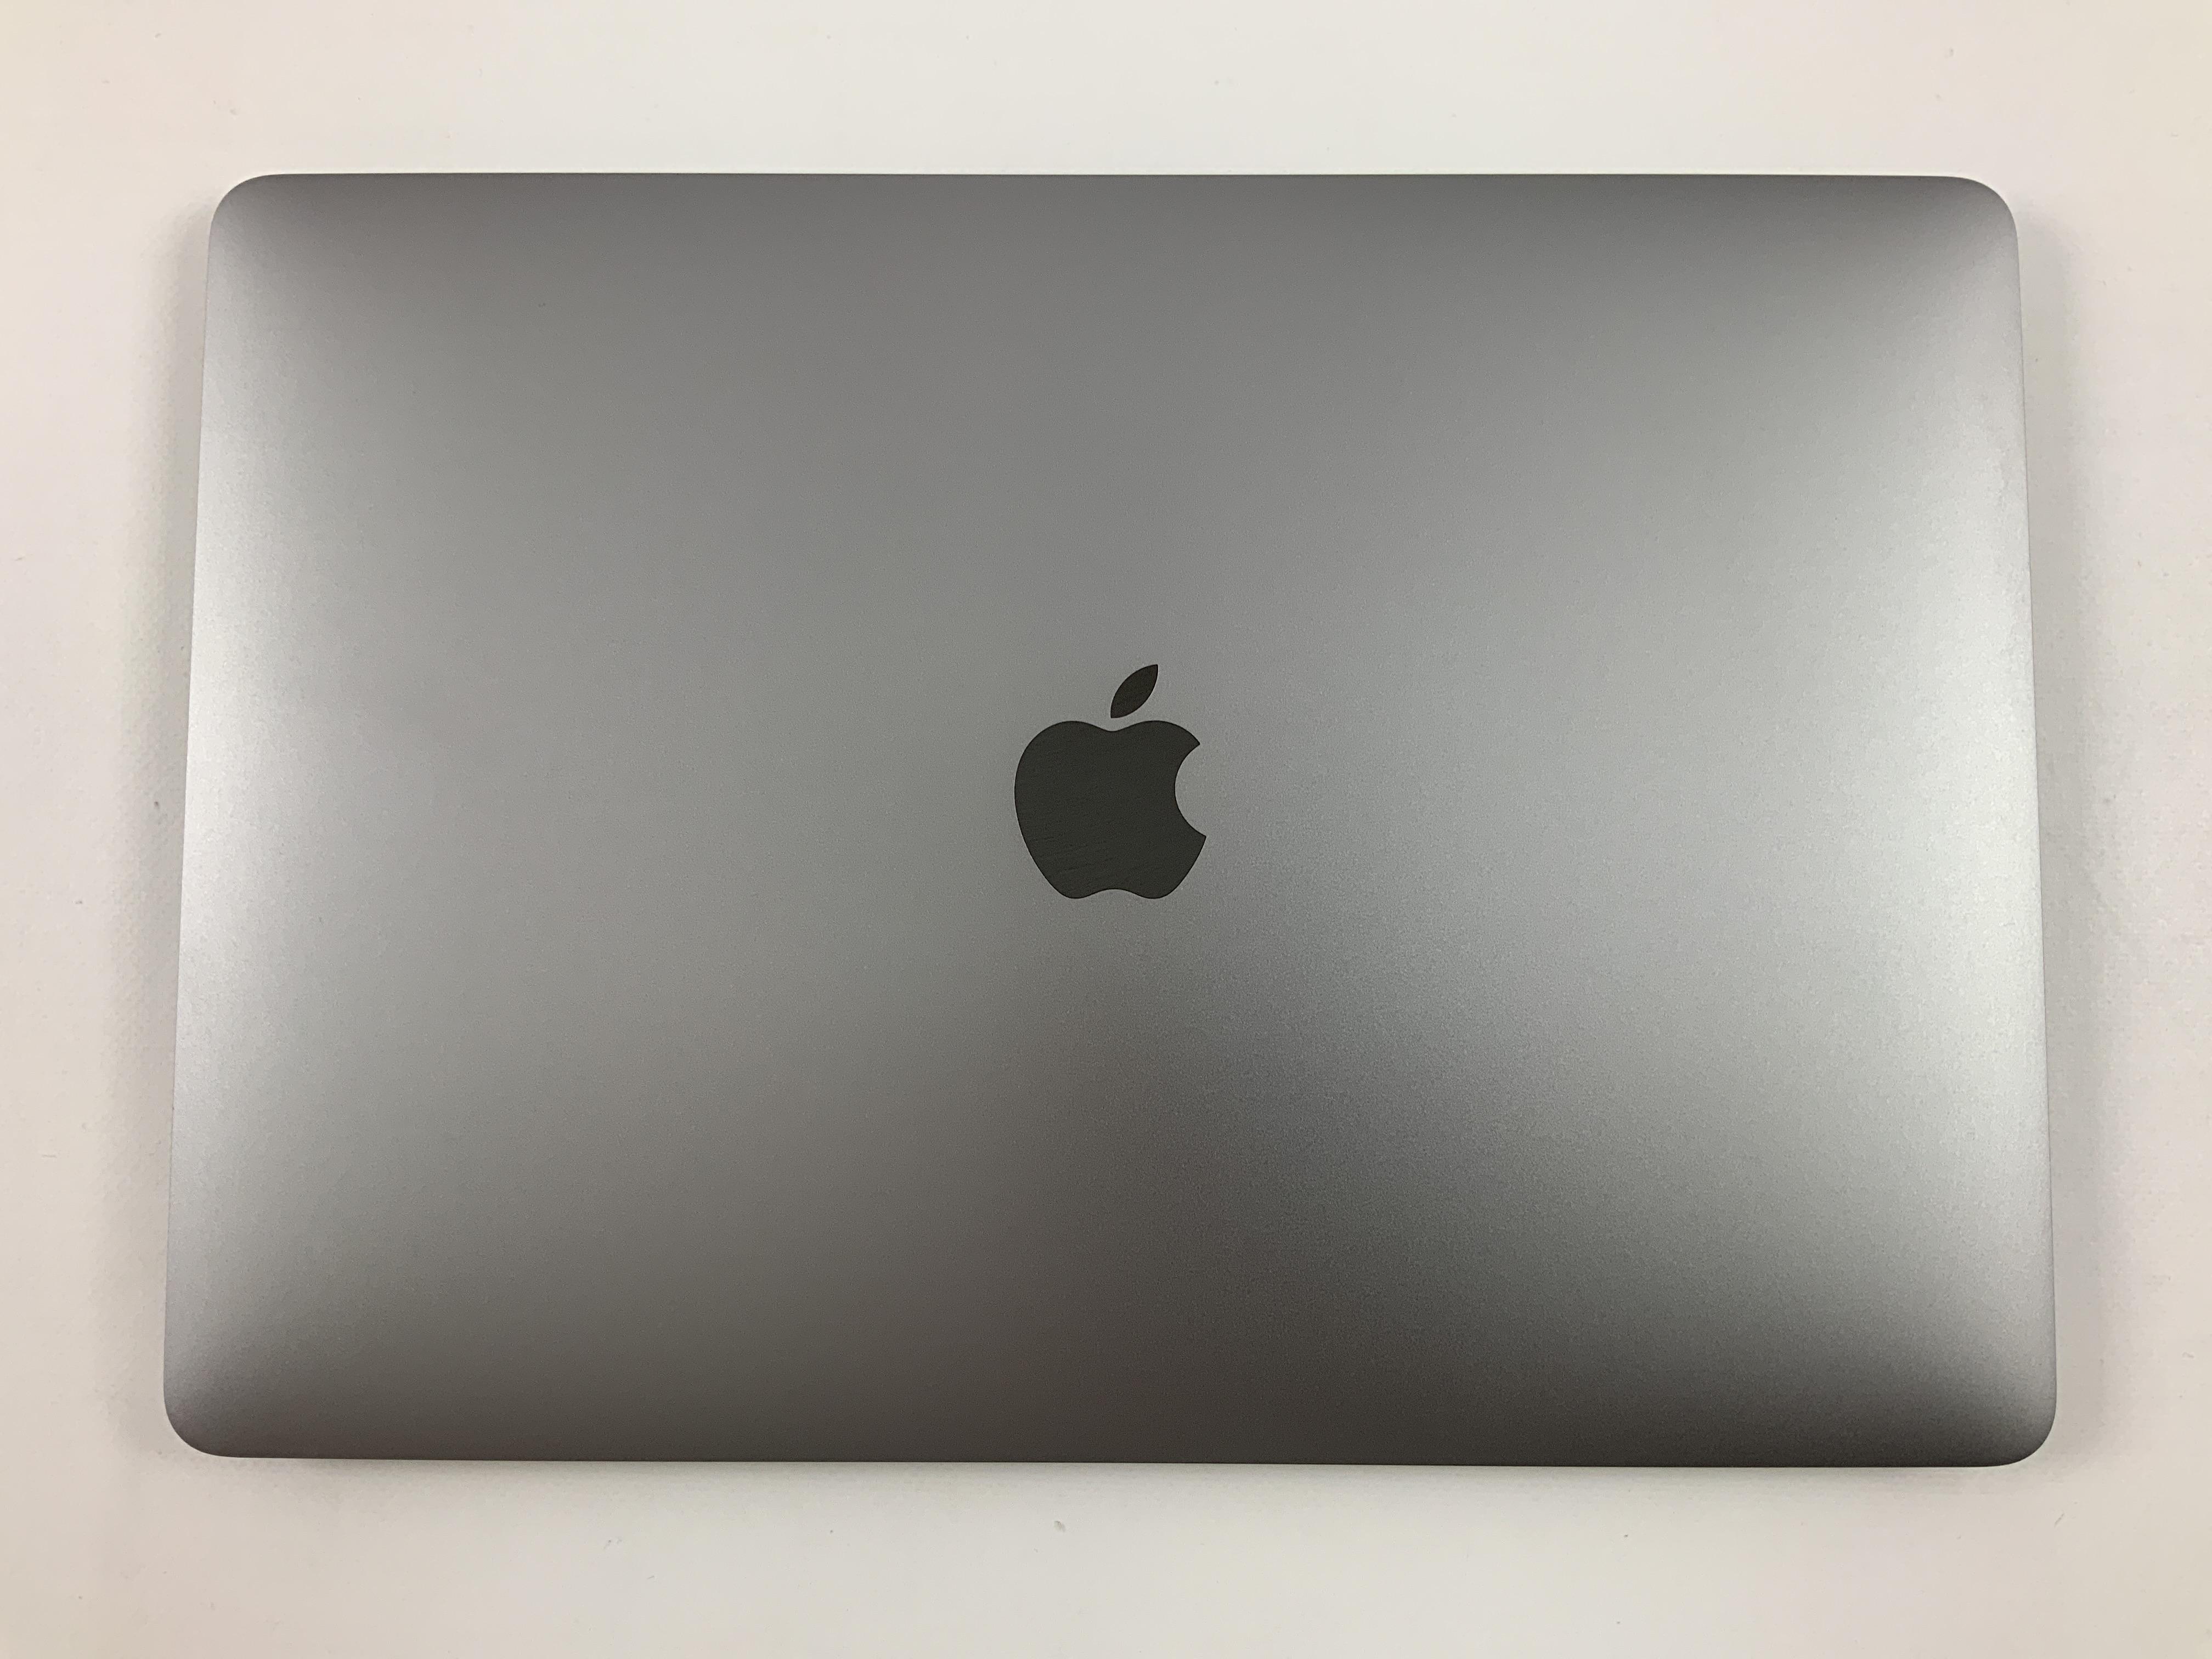 MacBook Pro (13-inch 2017 4 TBT3), 3.1 GHz Intel Core i5, 8 GB 2133 MHz DDR3 SDRAM, 256 GB Flash Storage, image 2